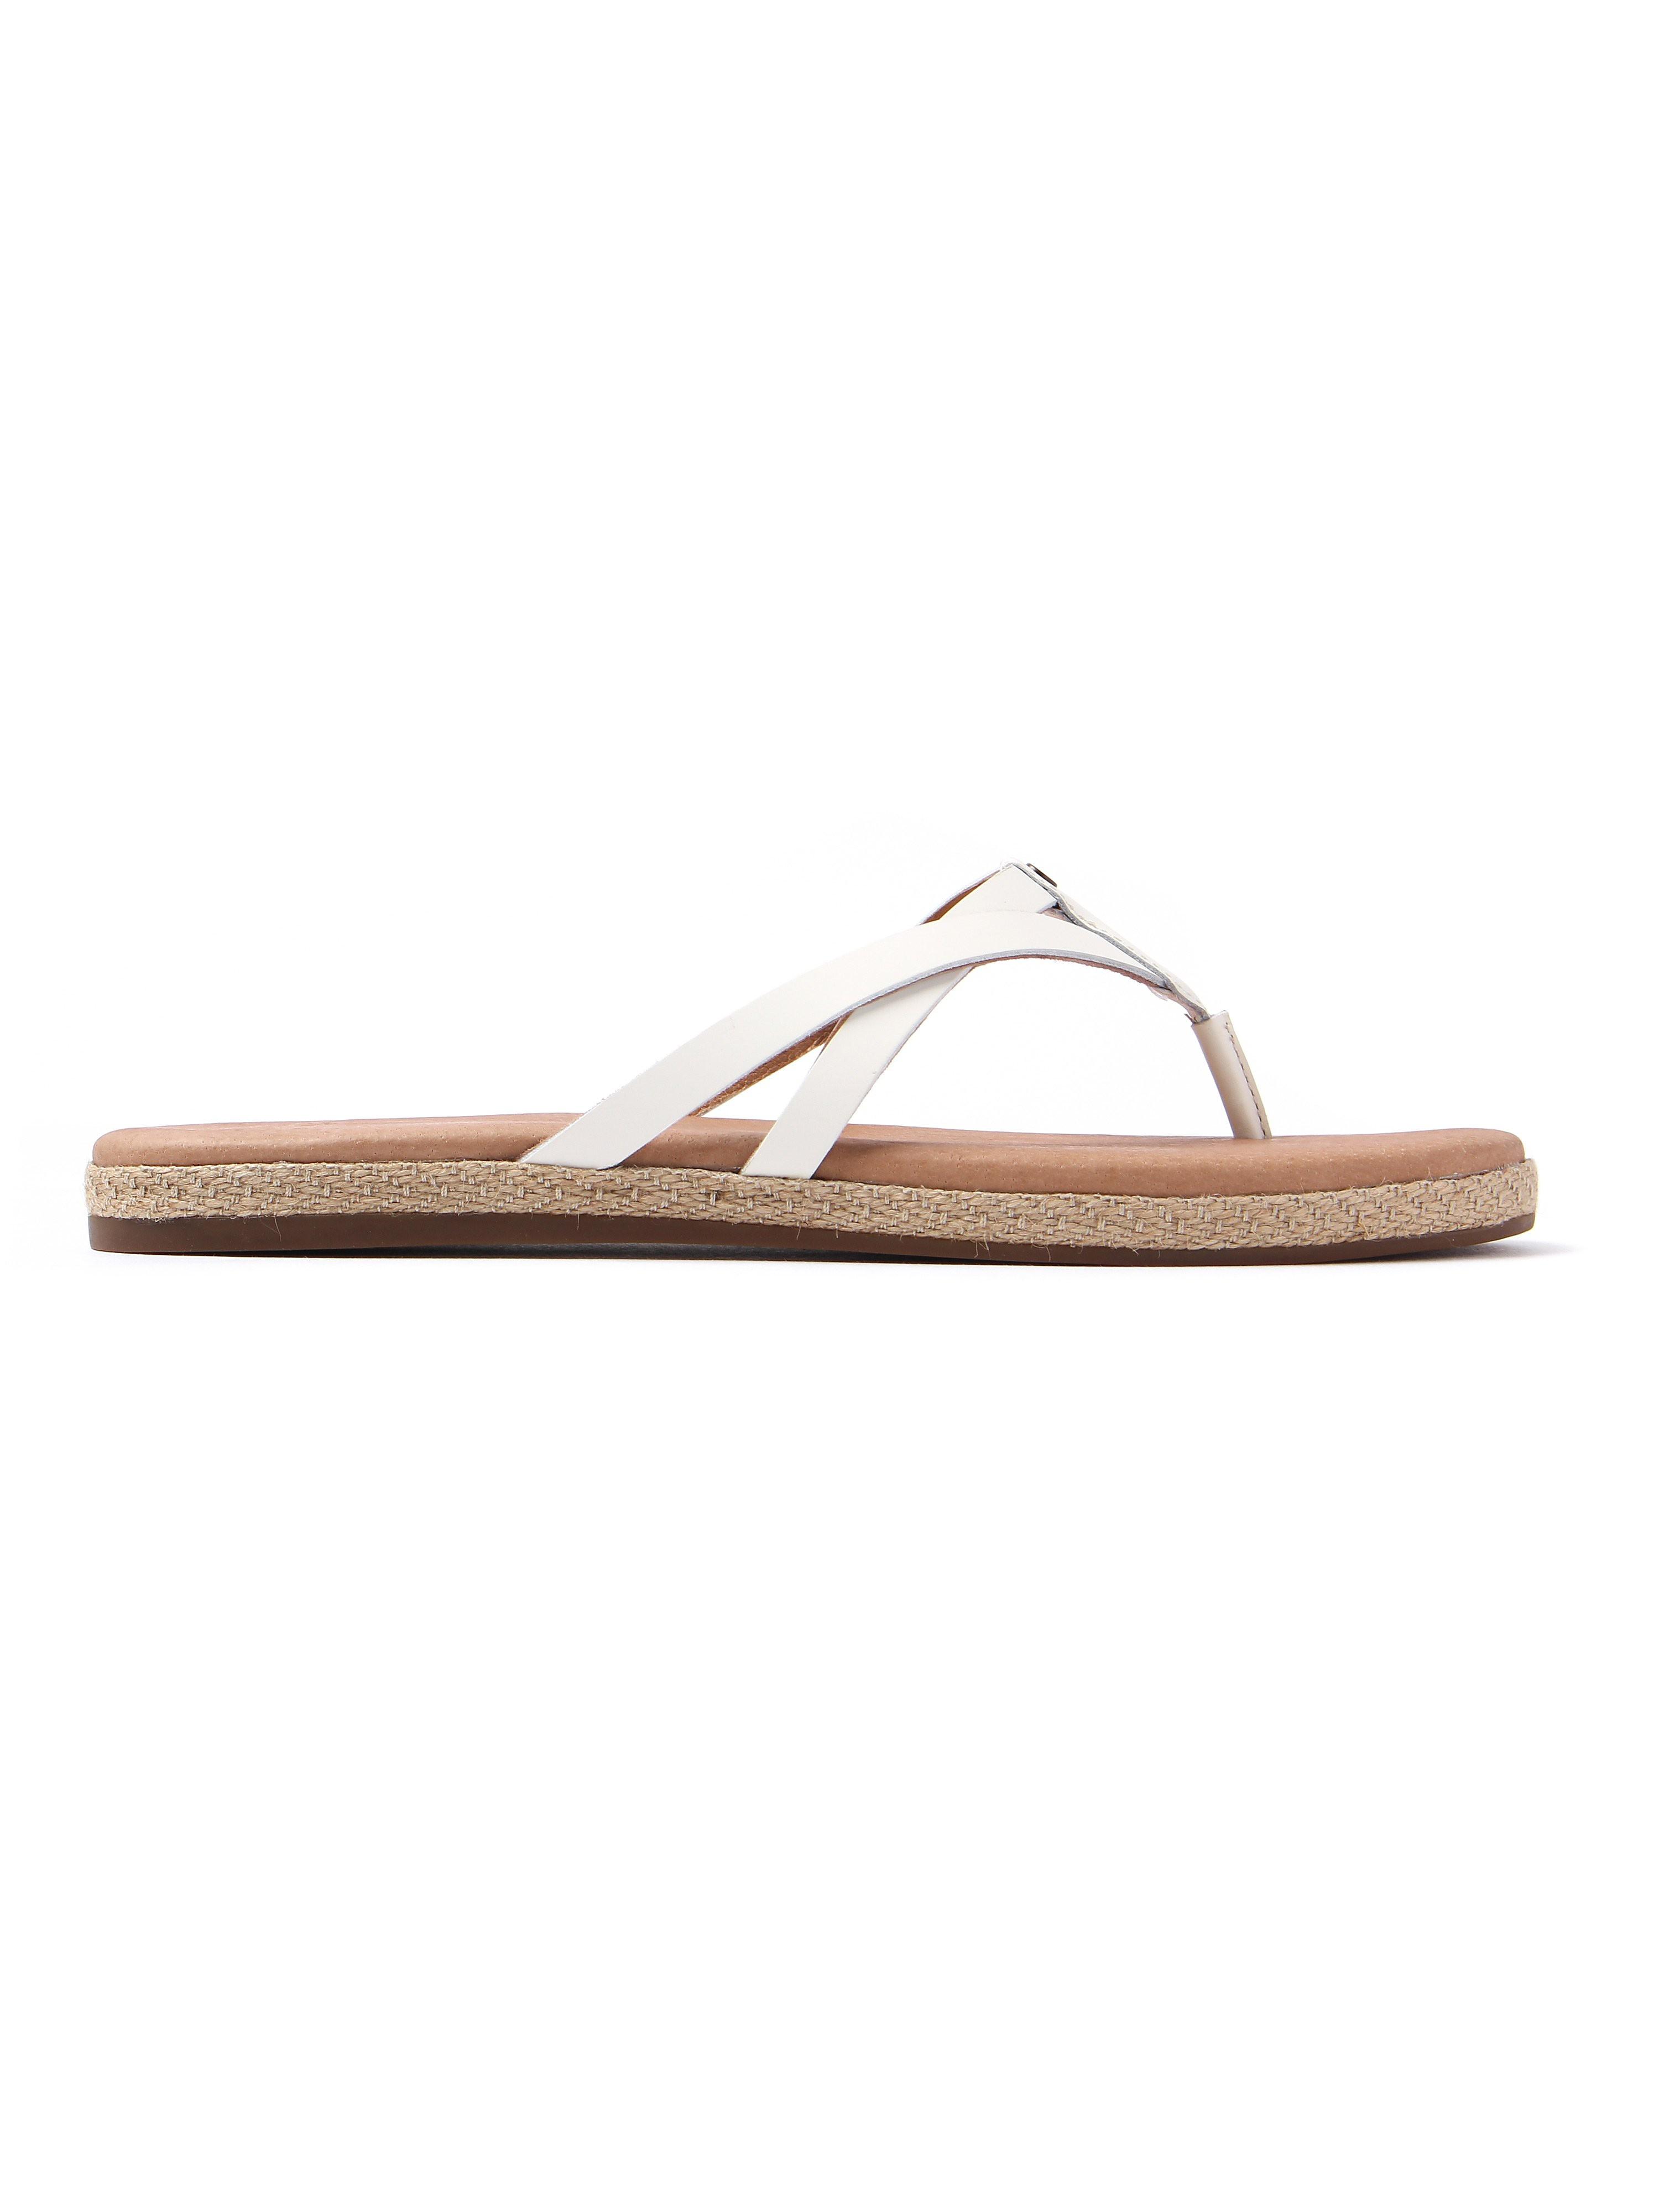 Ugg Women's Annice Leather Flip Flops - White